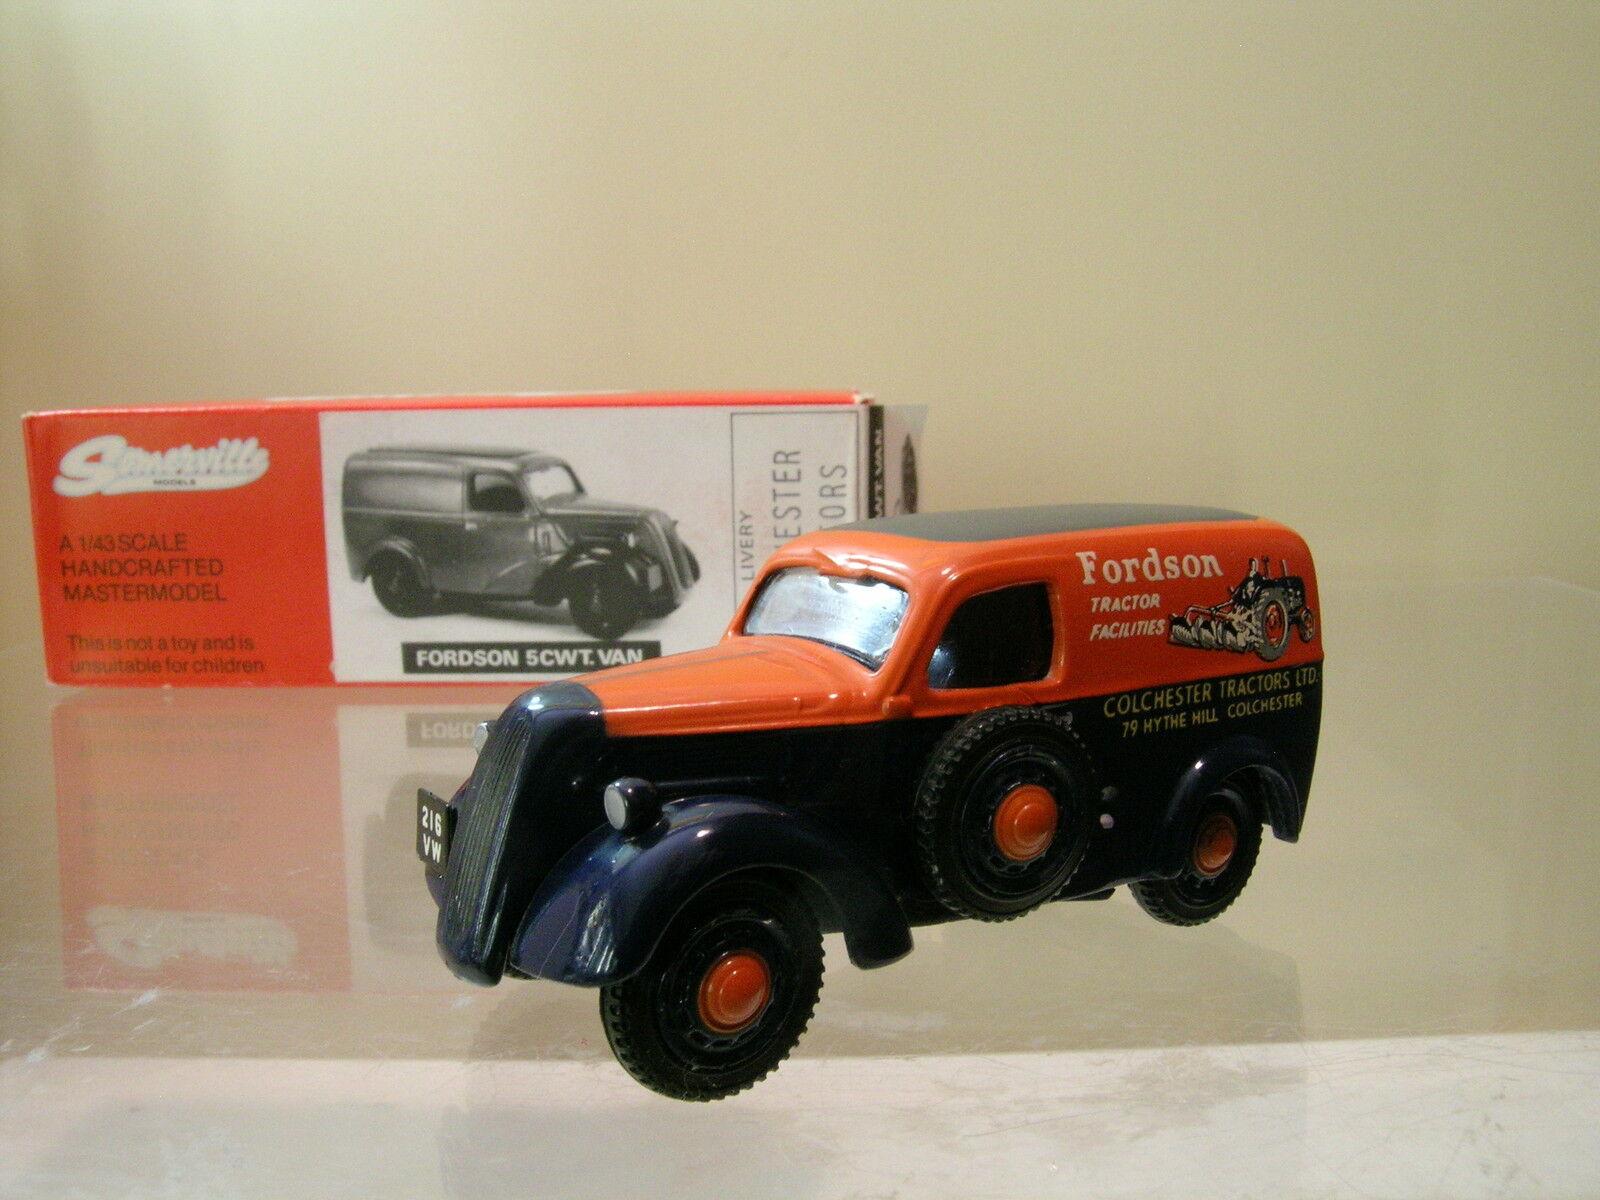 SOMERVILLE ModelllS 107 FORDSON 5CWT VAN COLCHESTER TRACTORS Orange HANDBUILT 1 43